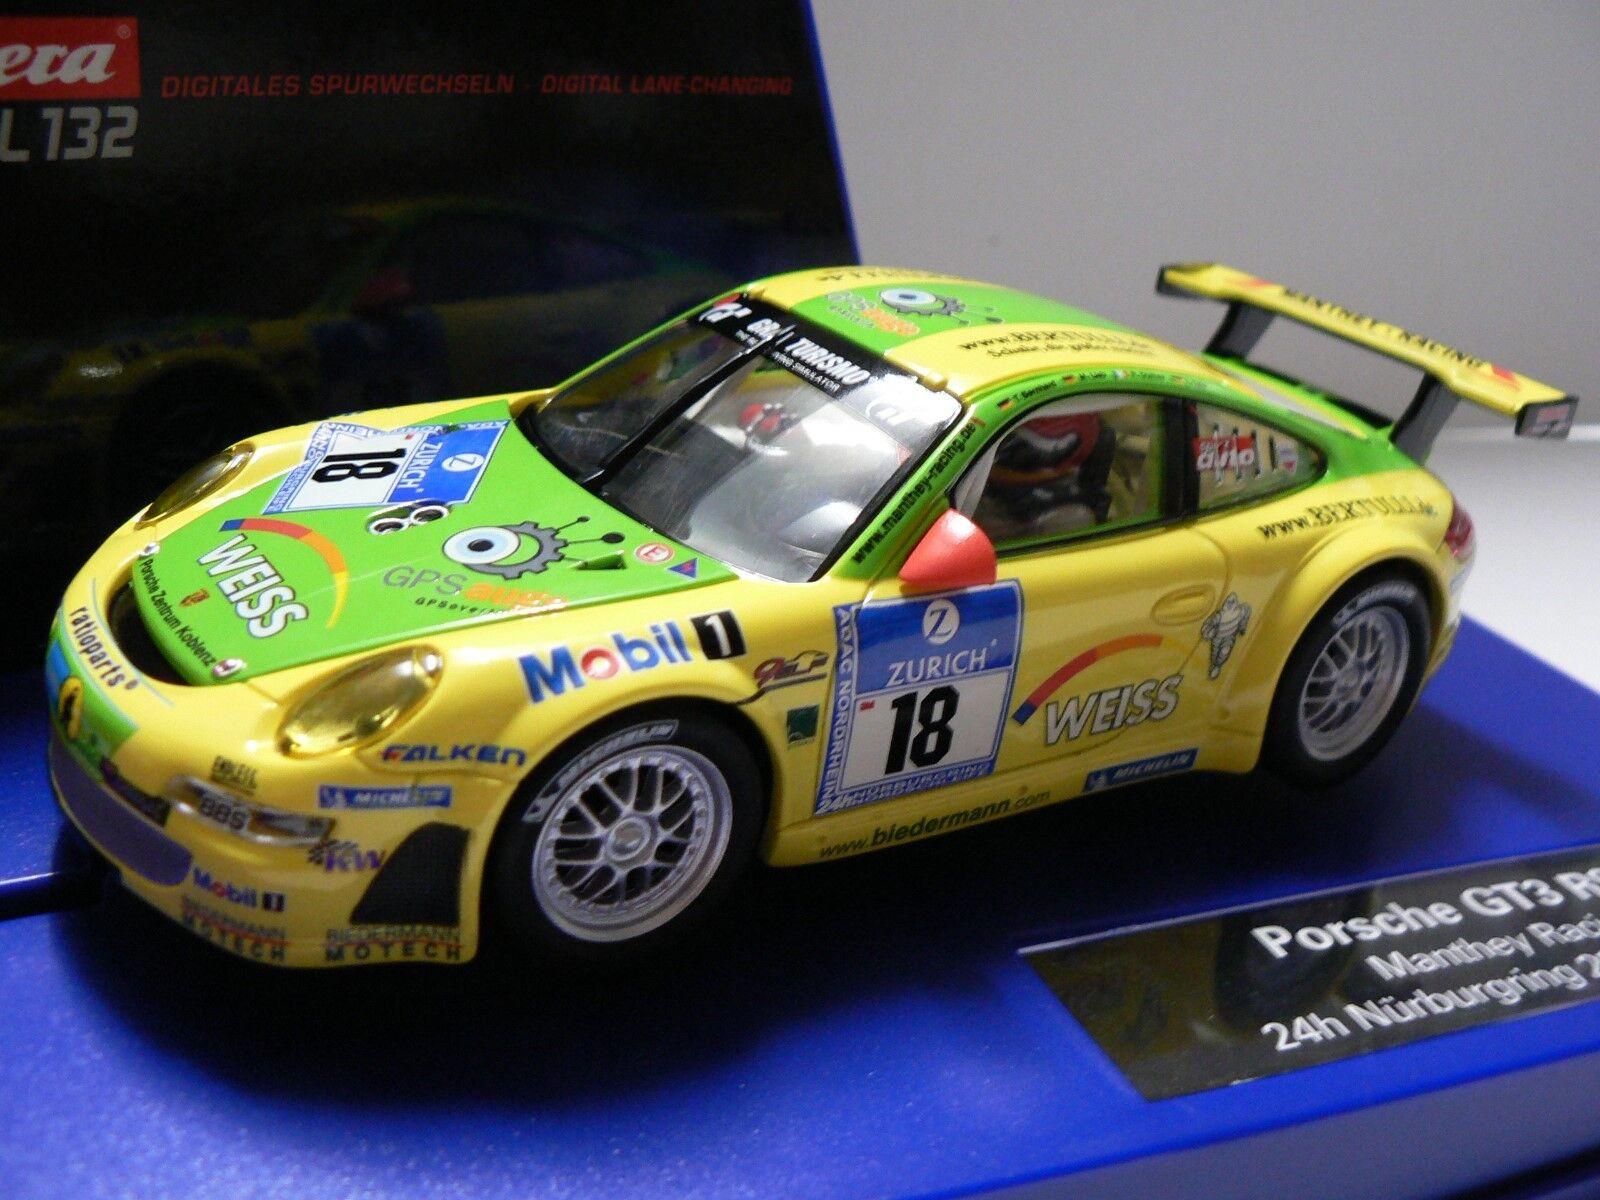 autorera Digital 132 30609 Porsche GT3 Rsr uomothey Racing 24 H Nürburgring Nuovo